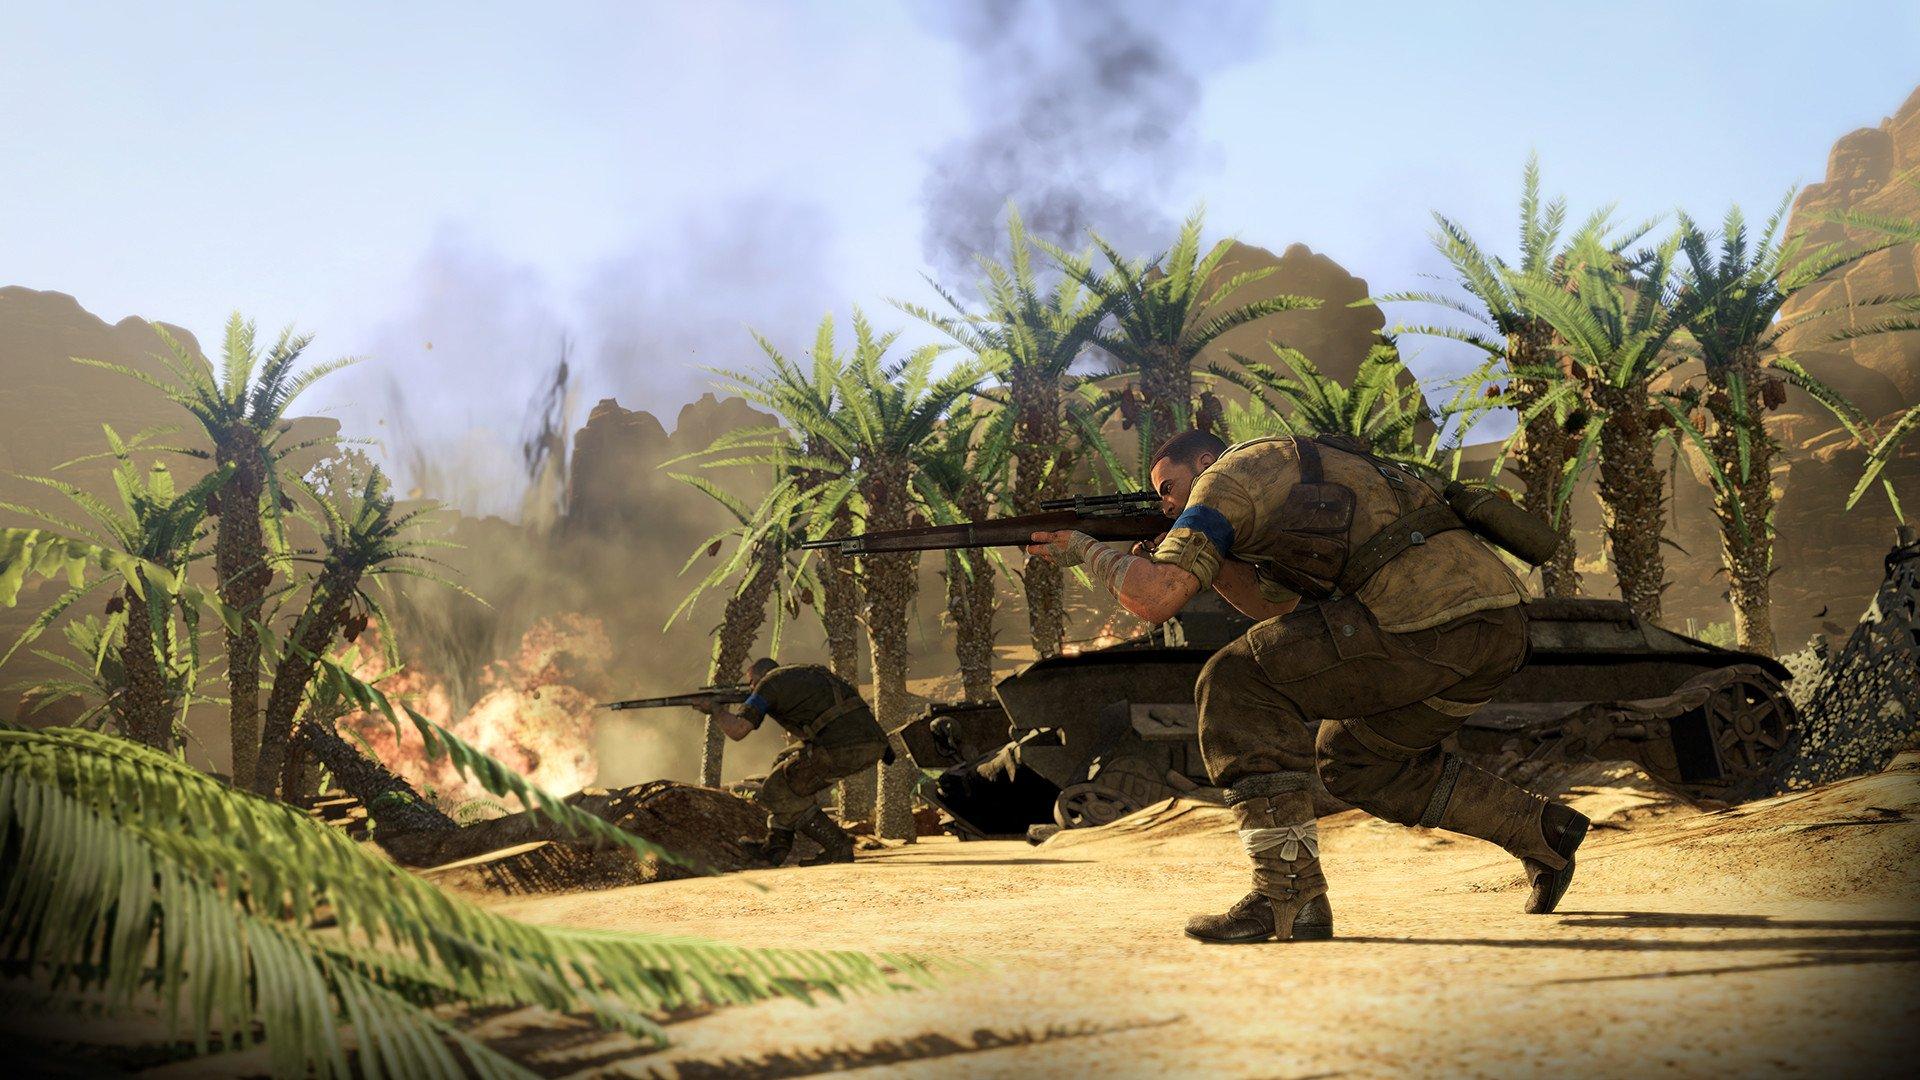 sniper elite 3 2537593 تصاویر جدیدی از Sniper Elite 3 منتشر شد : بیابان گردی در آفریقا